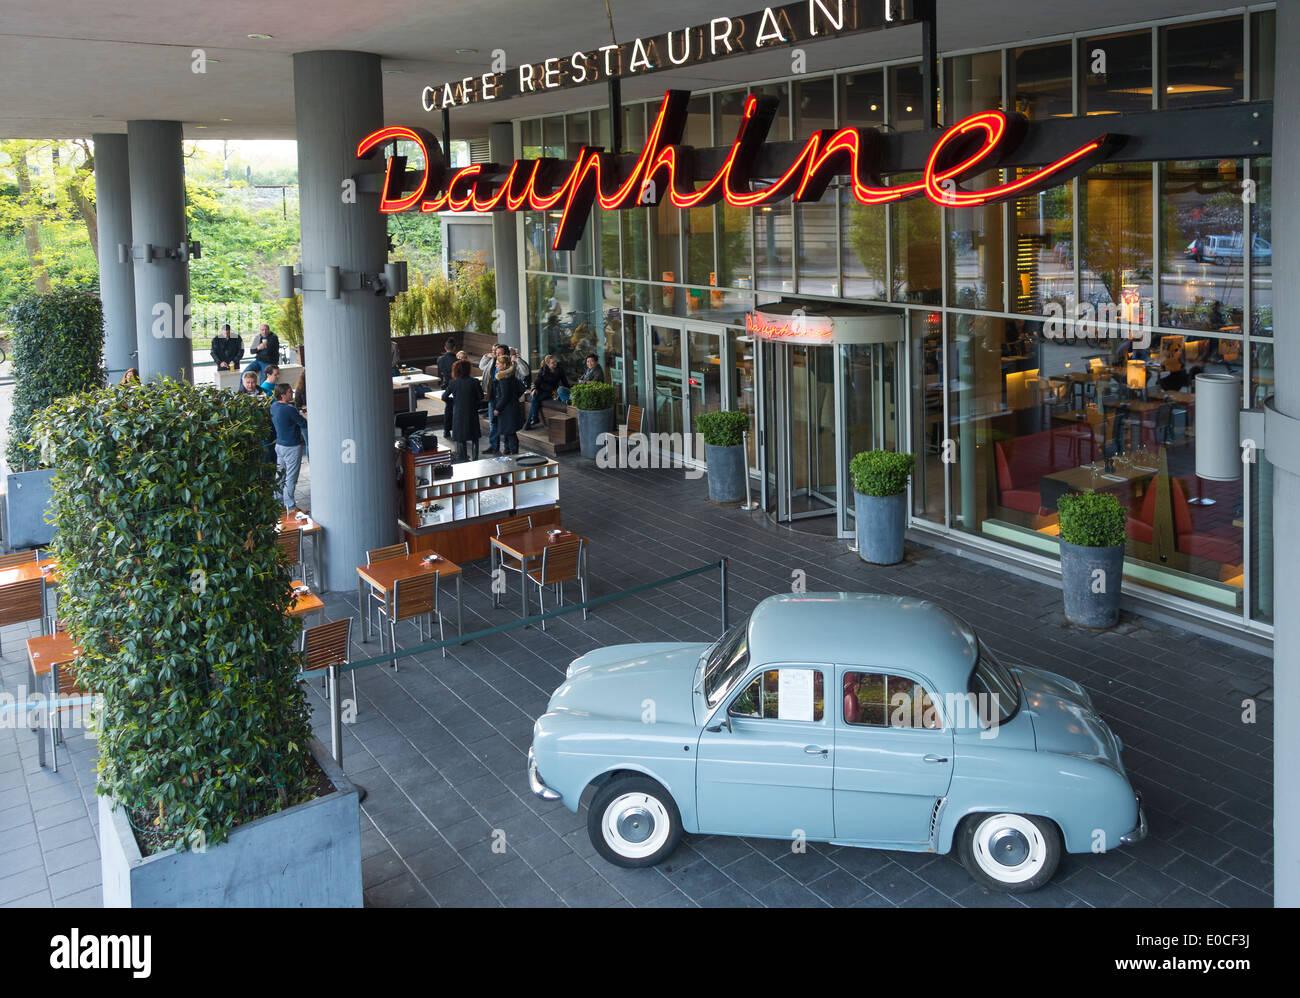 Restaurant Car Stockfotos & Restaurant Car Bilder - Alamy